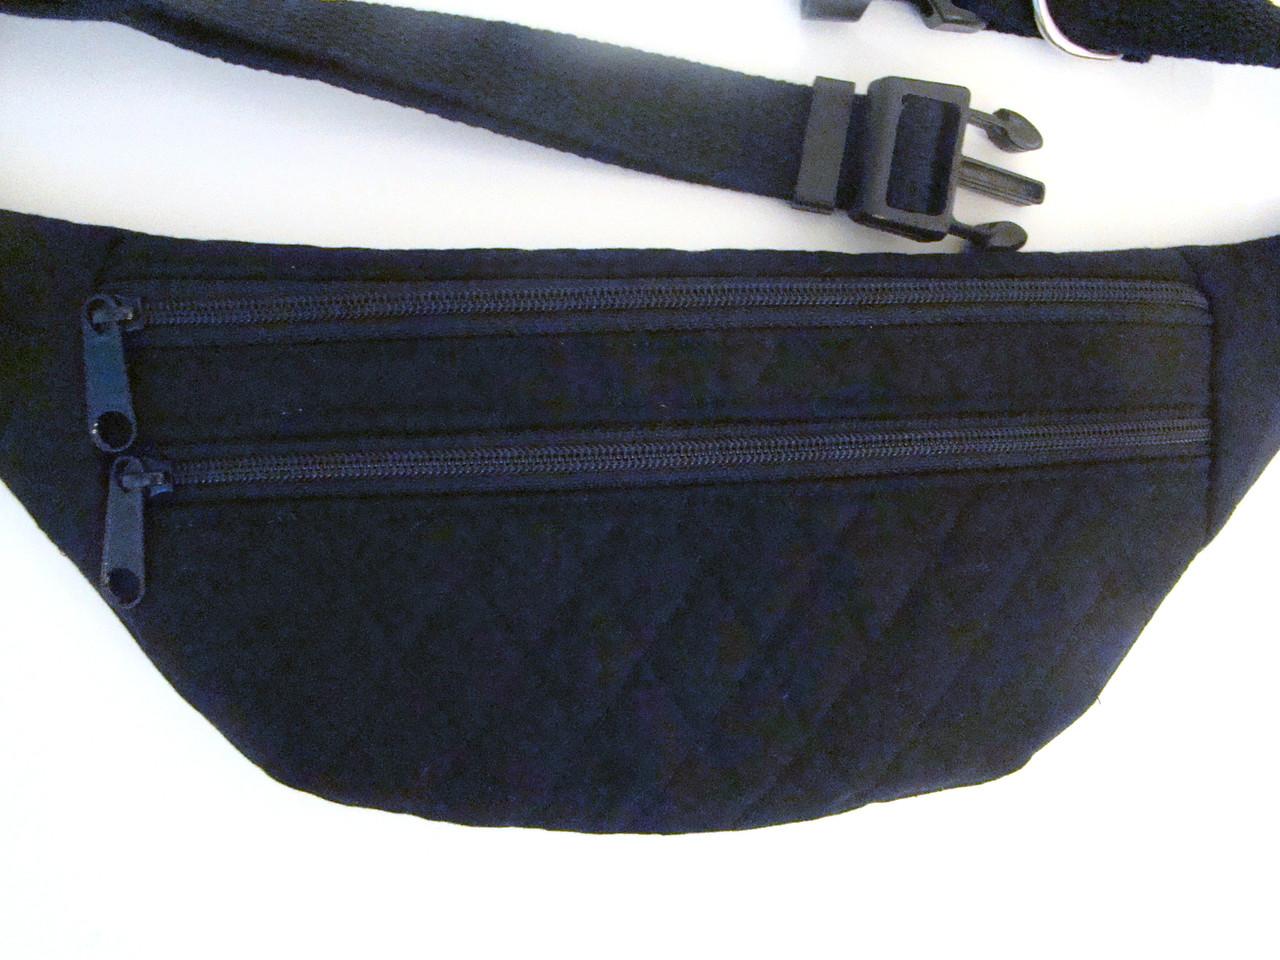 Black Quilted Double Zipper Slimline Fanny Pack (FP-BLACKQUILT)